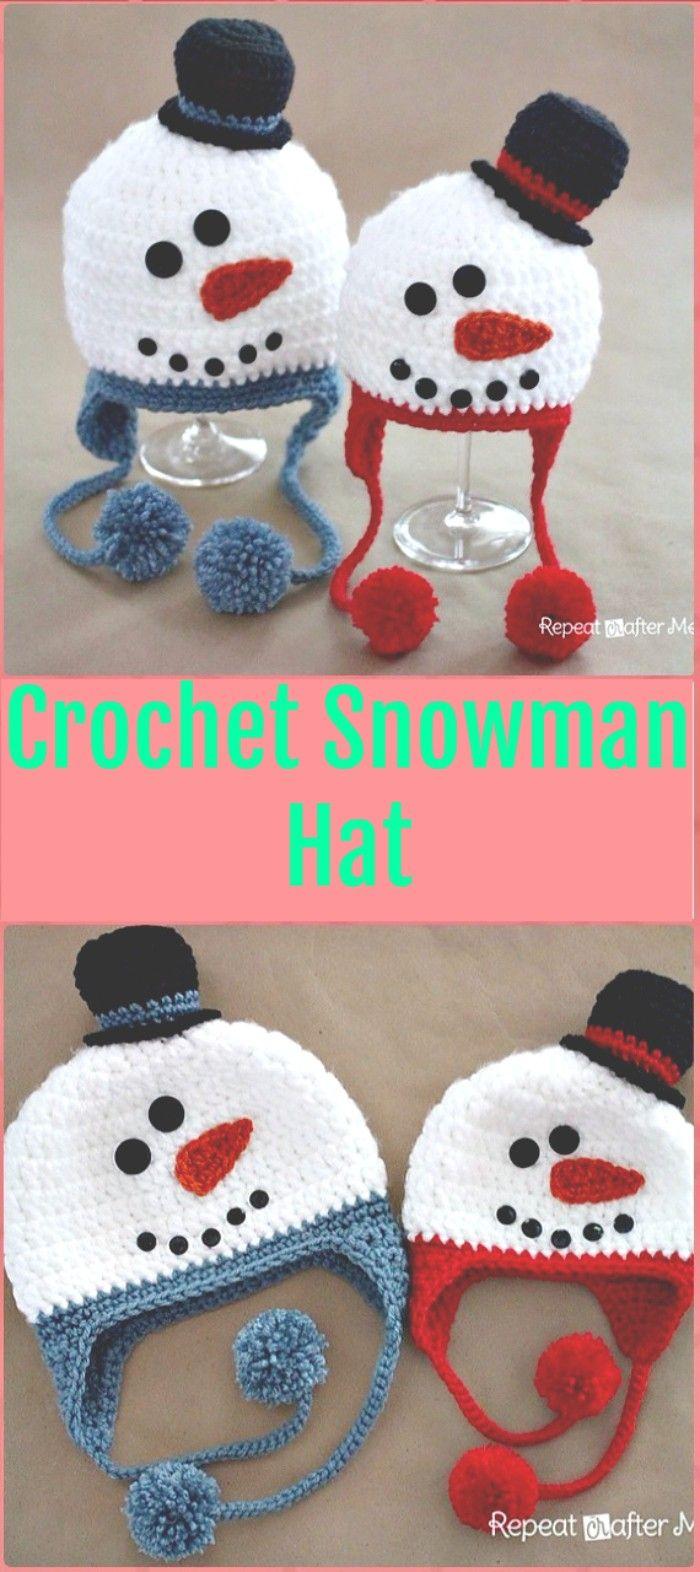 15 padrões de chapéu de Natal de crochê bonito - livre padrões